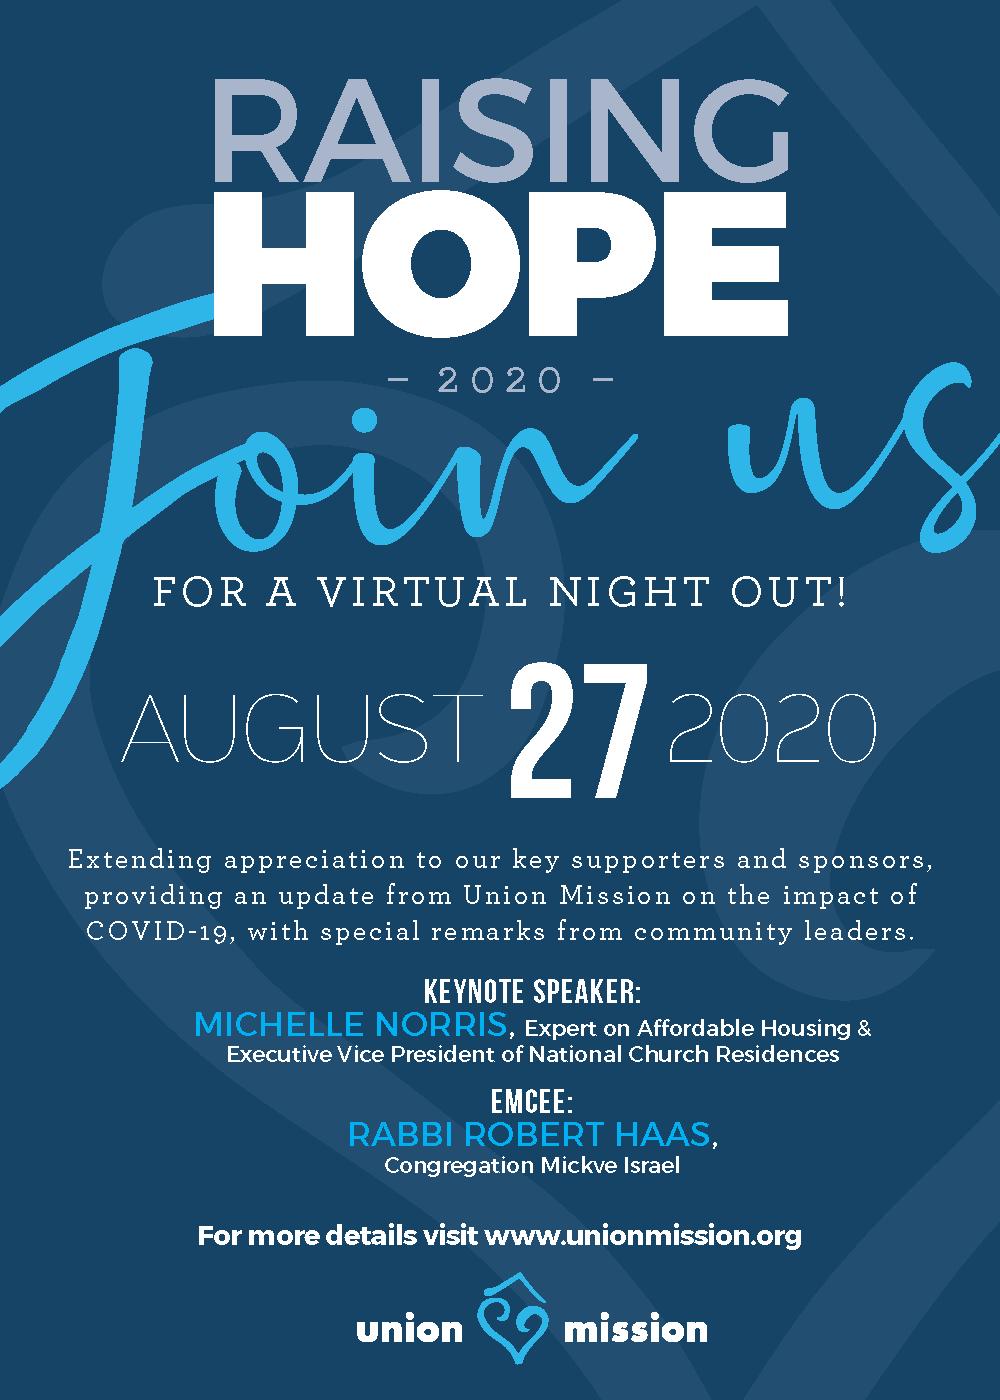 Raising Hope invitation